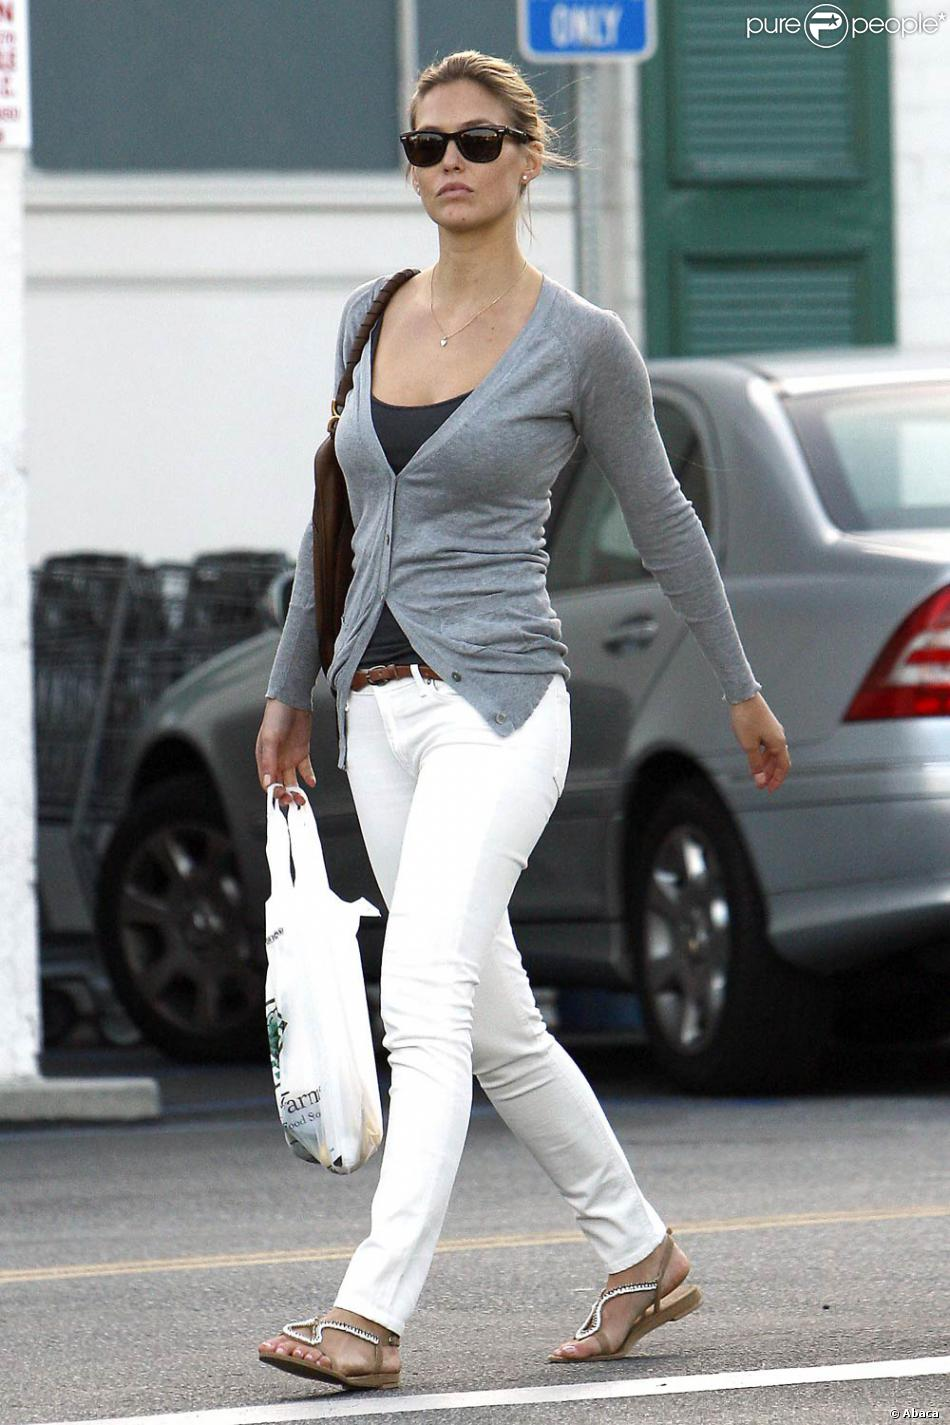 le top model isra lien bar refaeli a succomb la mode du pantalon blanc. Black Bedroom Furniture Sets. Home Design Ideas